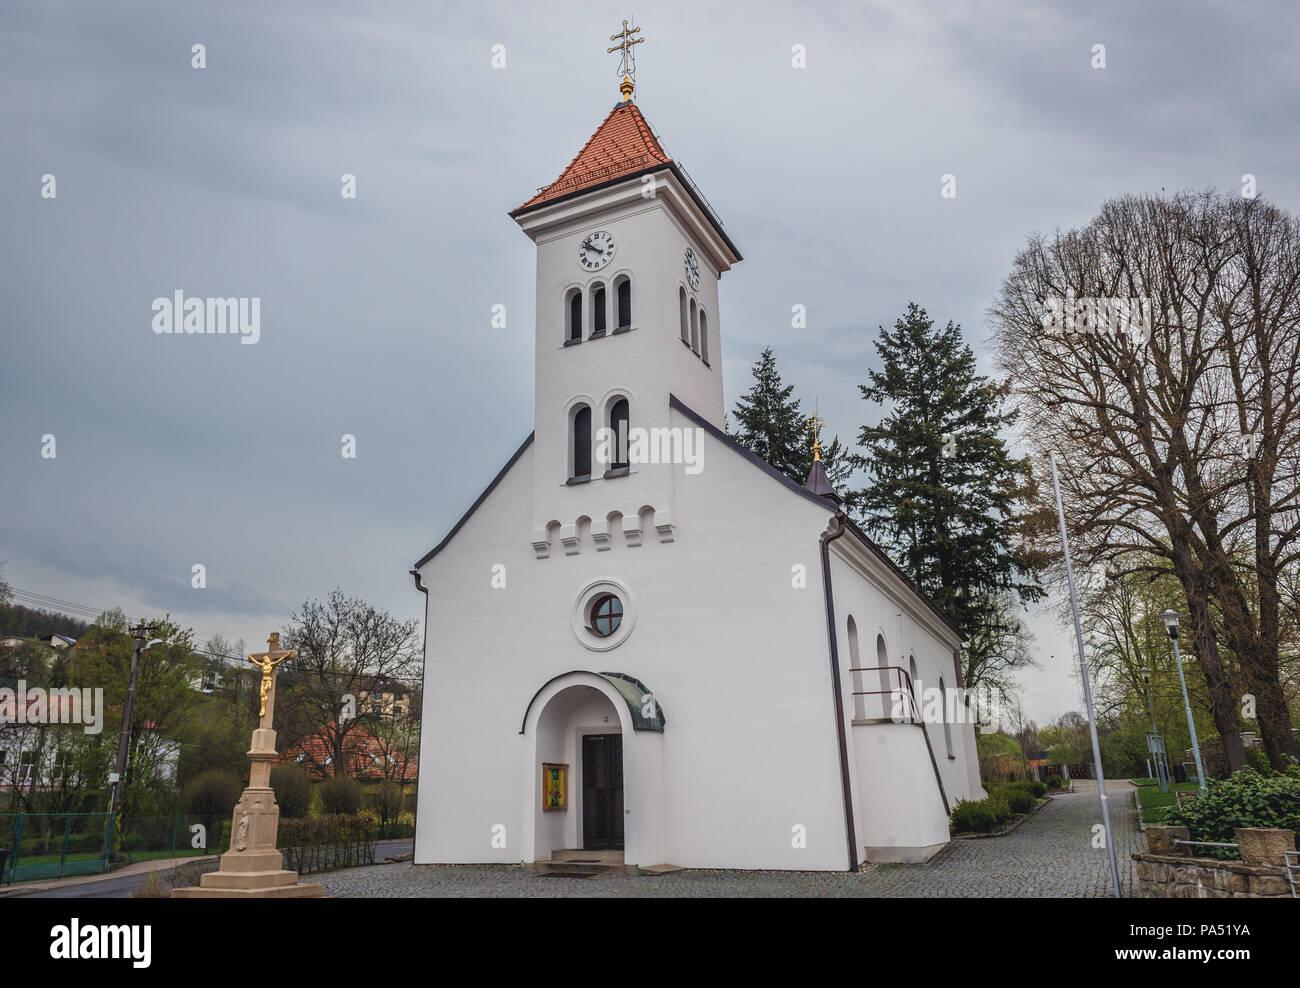 Saint Bartholomew Church in Breznice village in Zlin Region of the Czech Republic - Stock Image